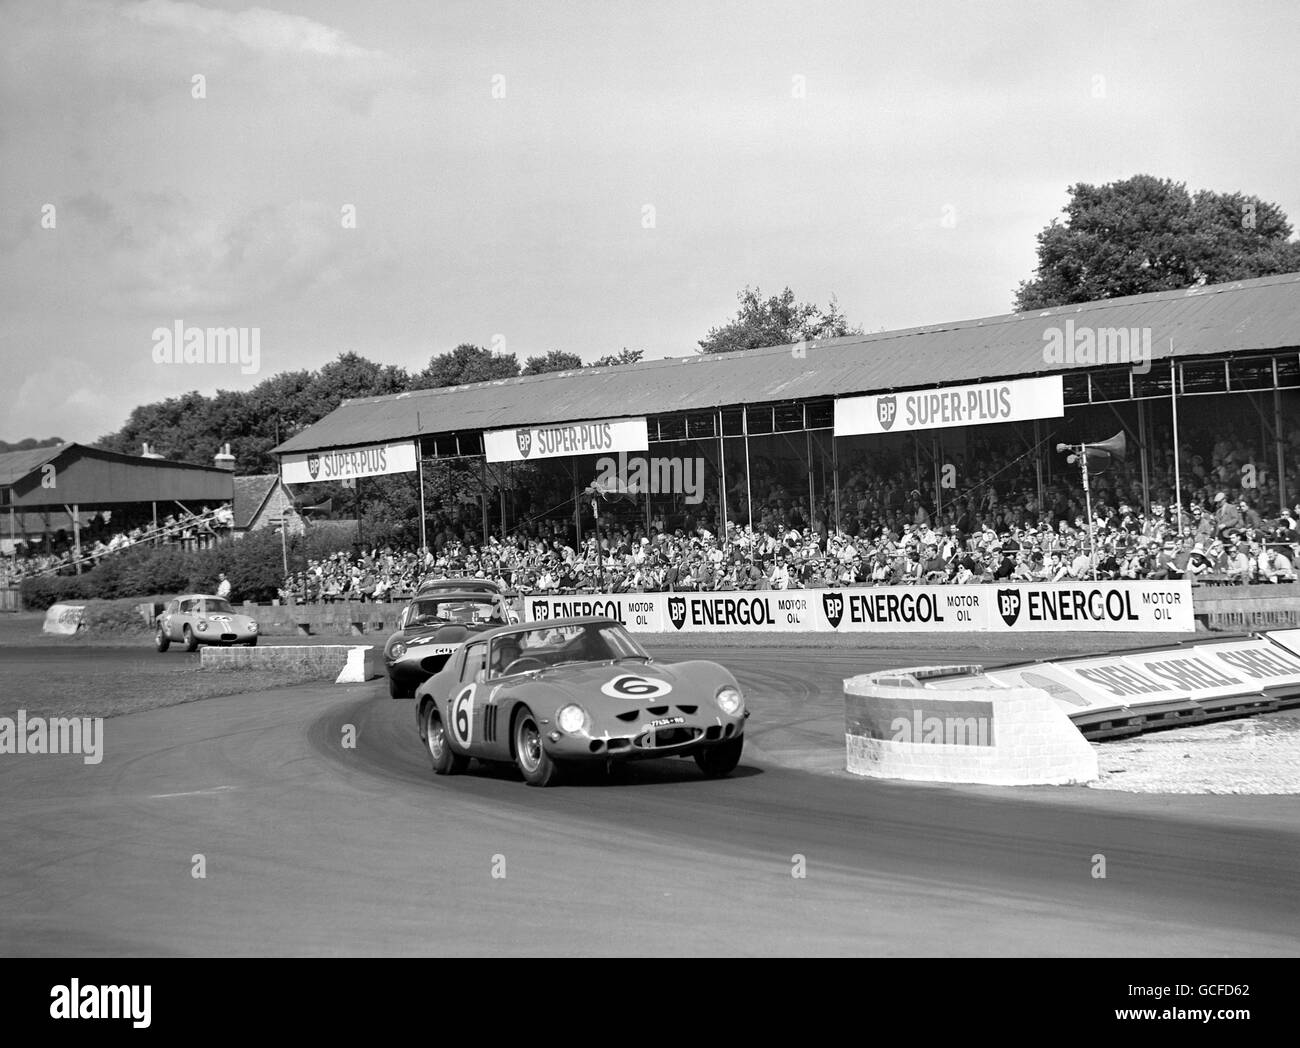 Motor Racing - 27th RAC Tourist Trophy Race - Goodwood - Stock Image